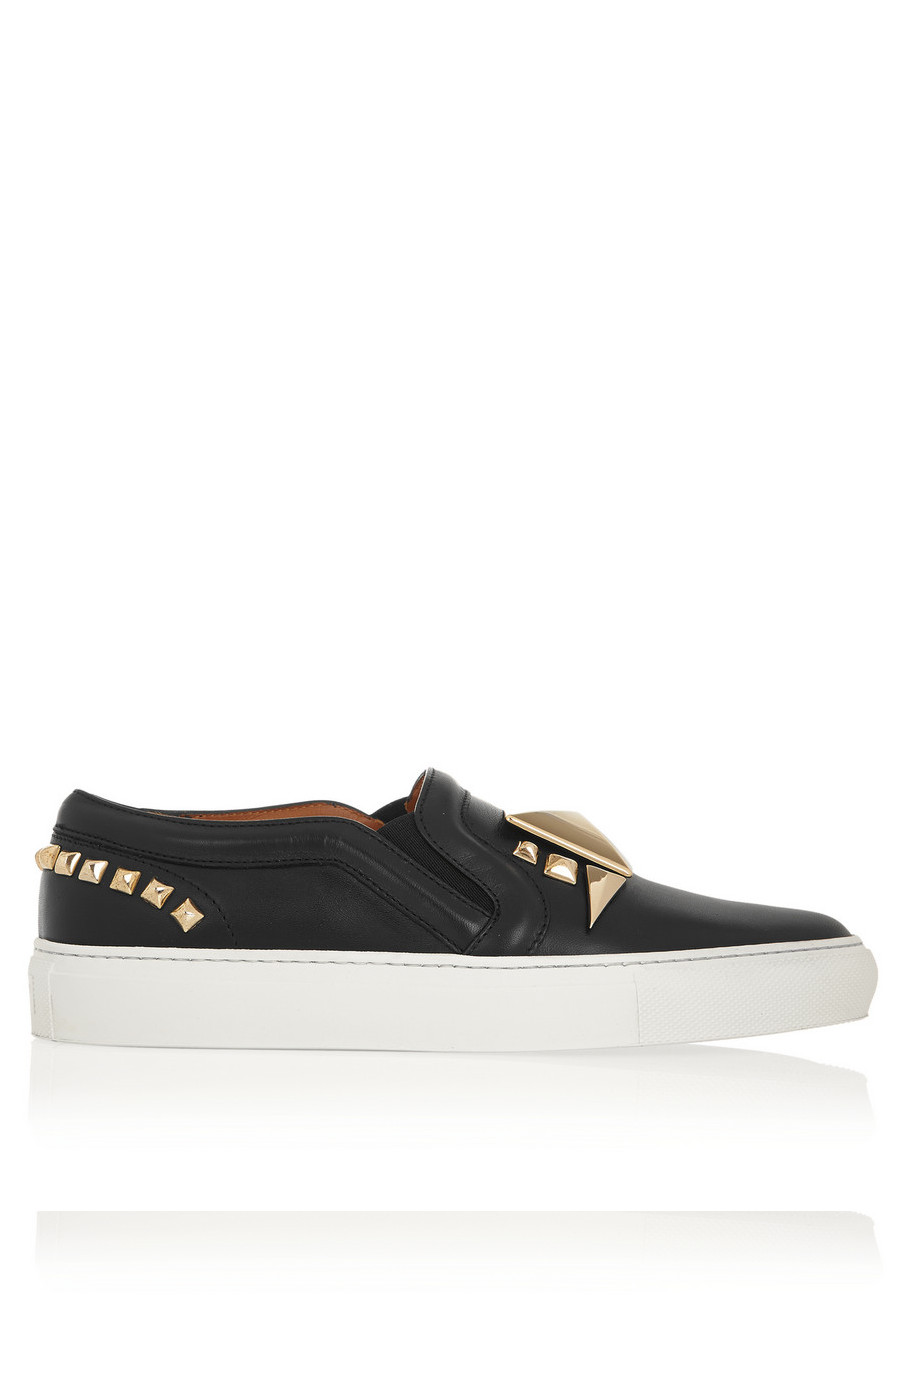 Givenchy - Slip-on(655 €)